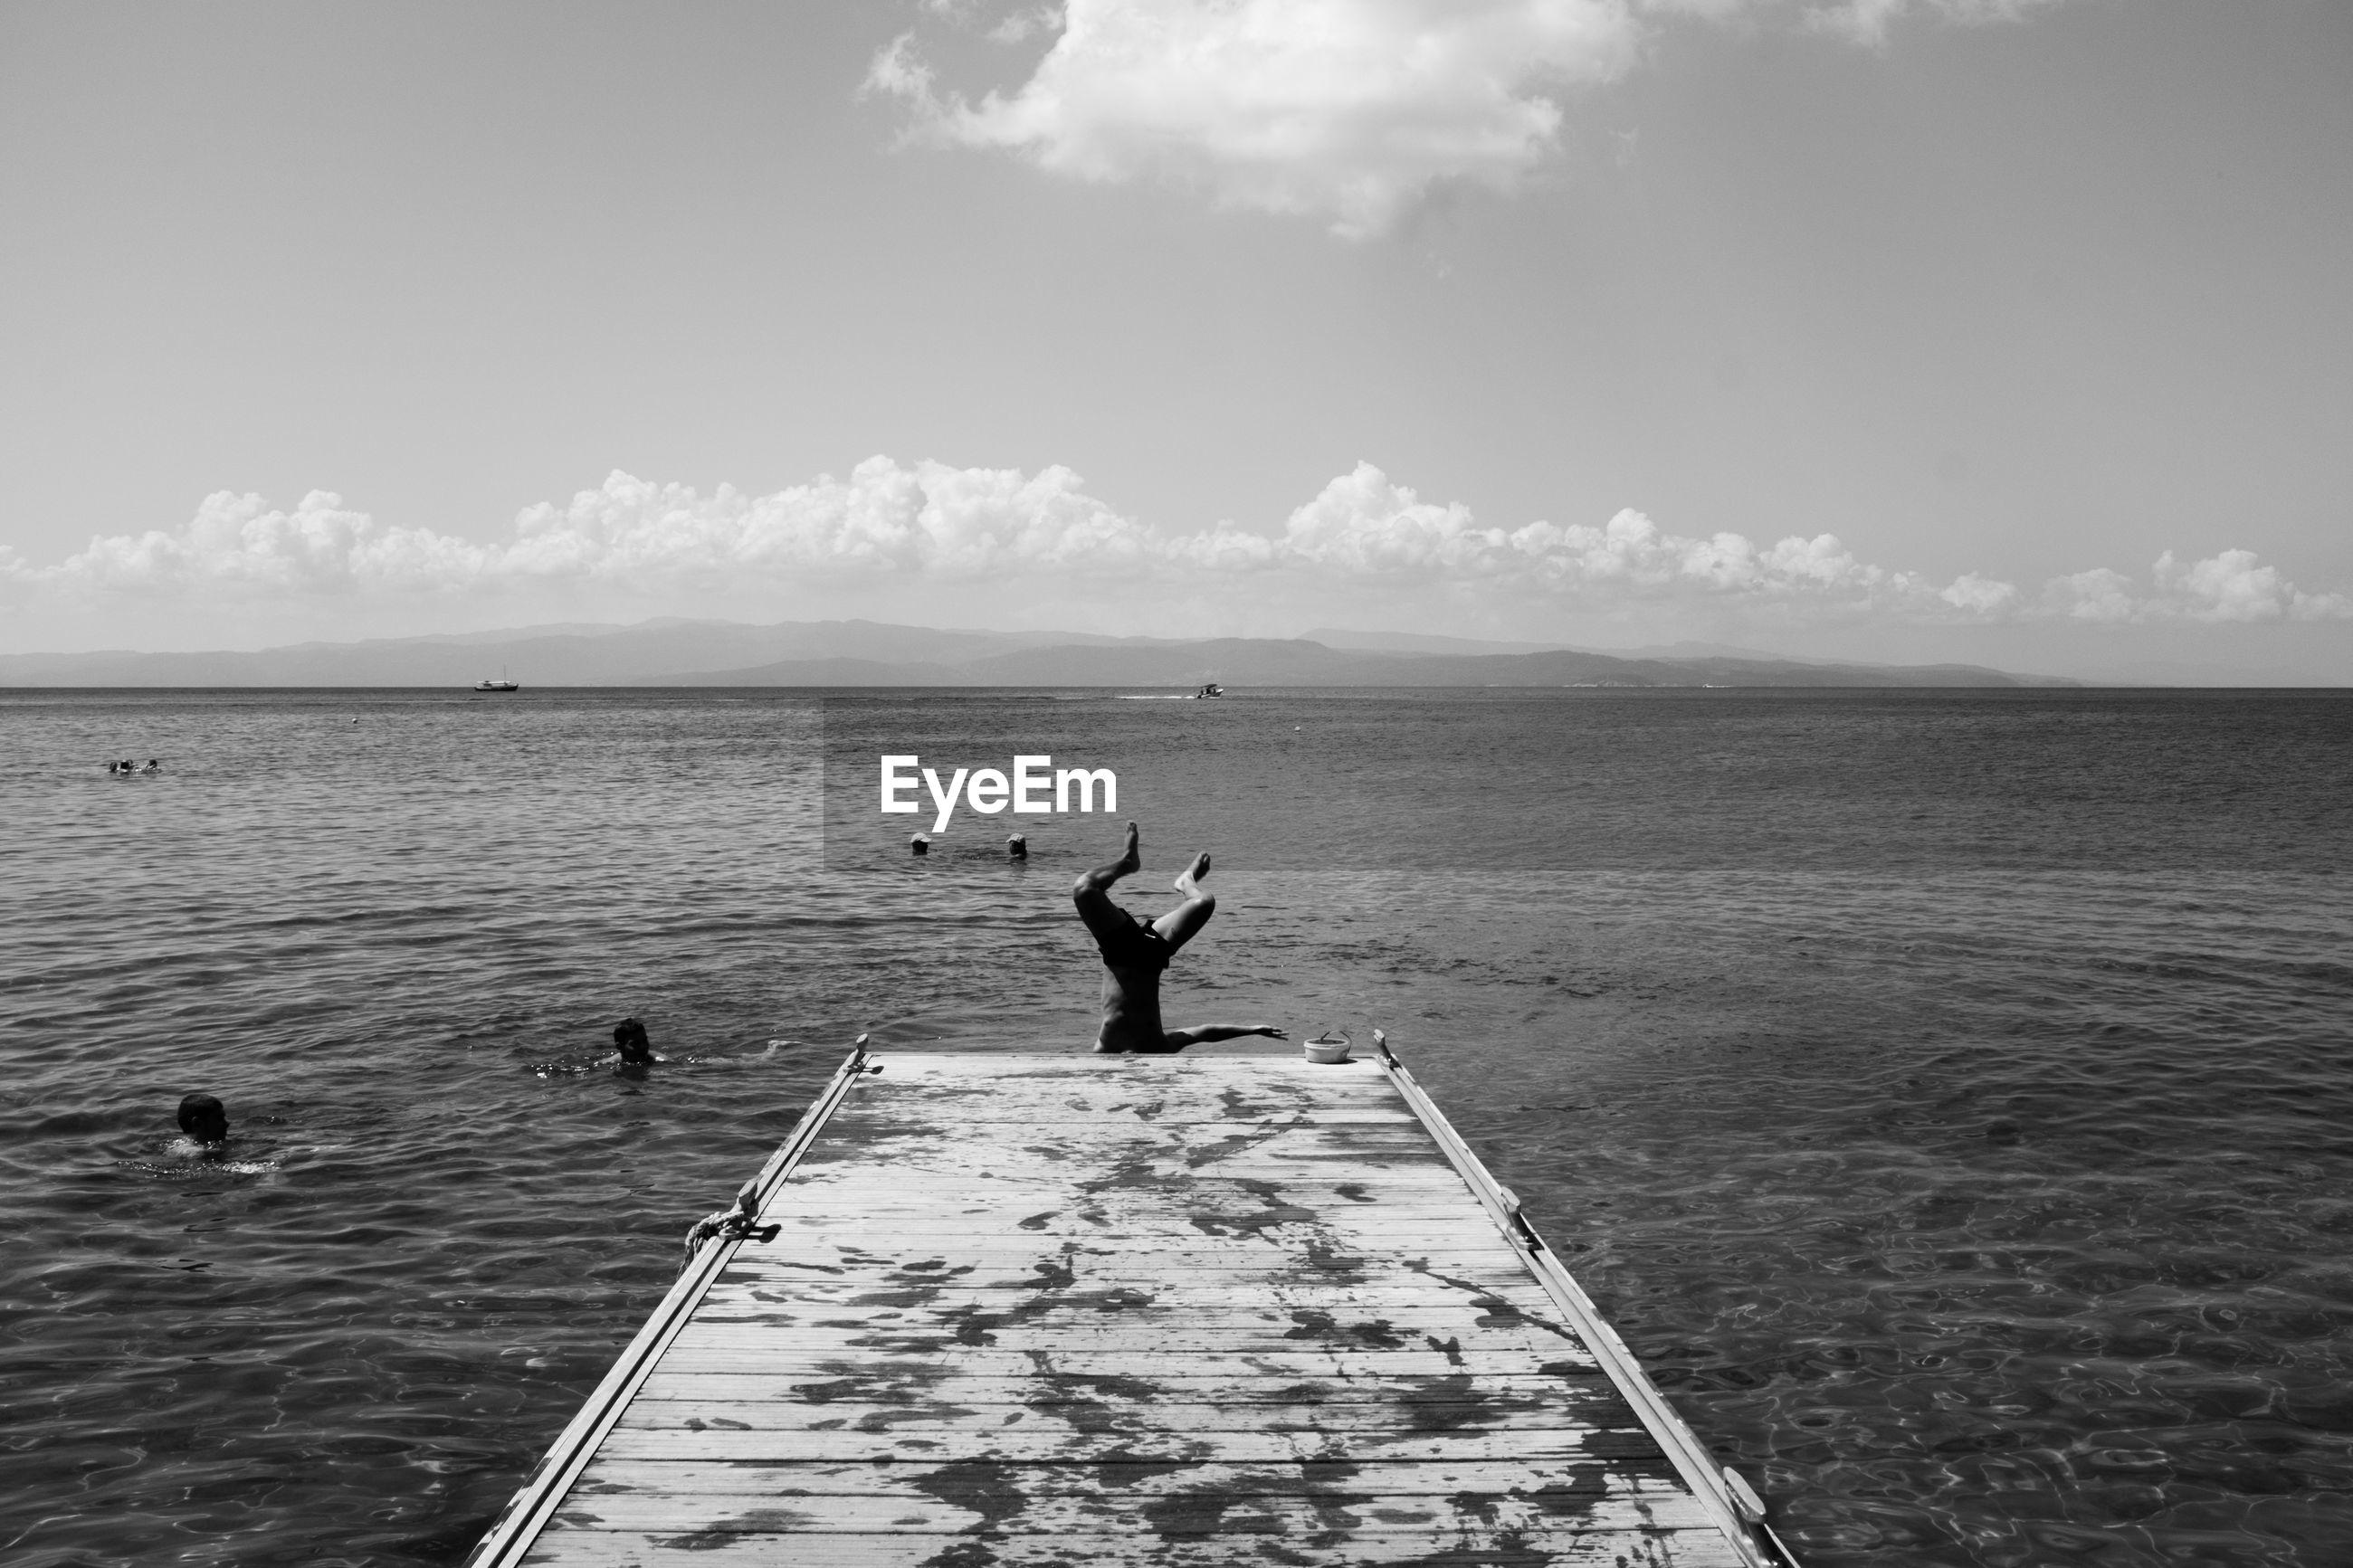 MAN STANDING ON SEA AGAINST SKY